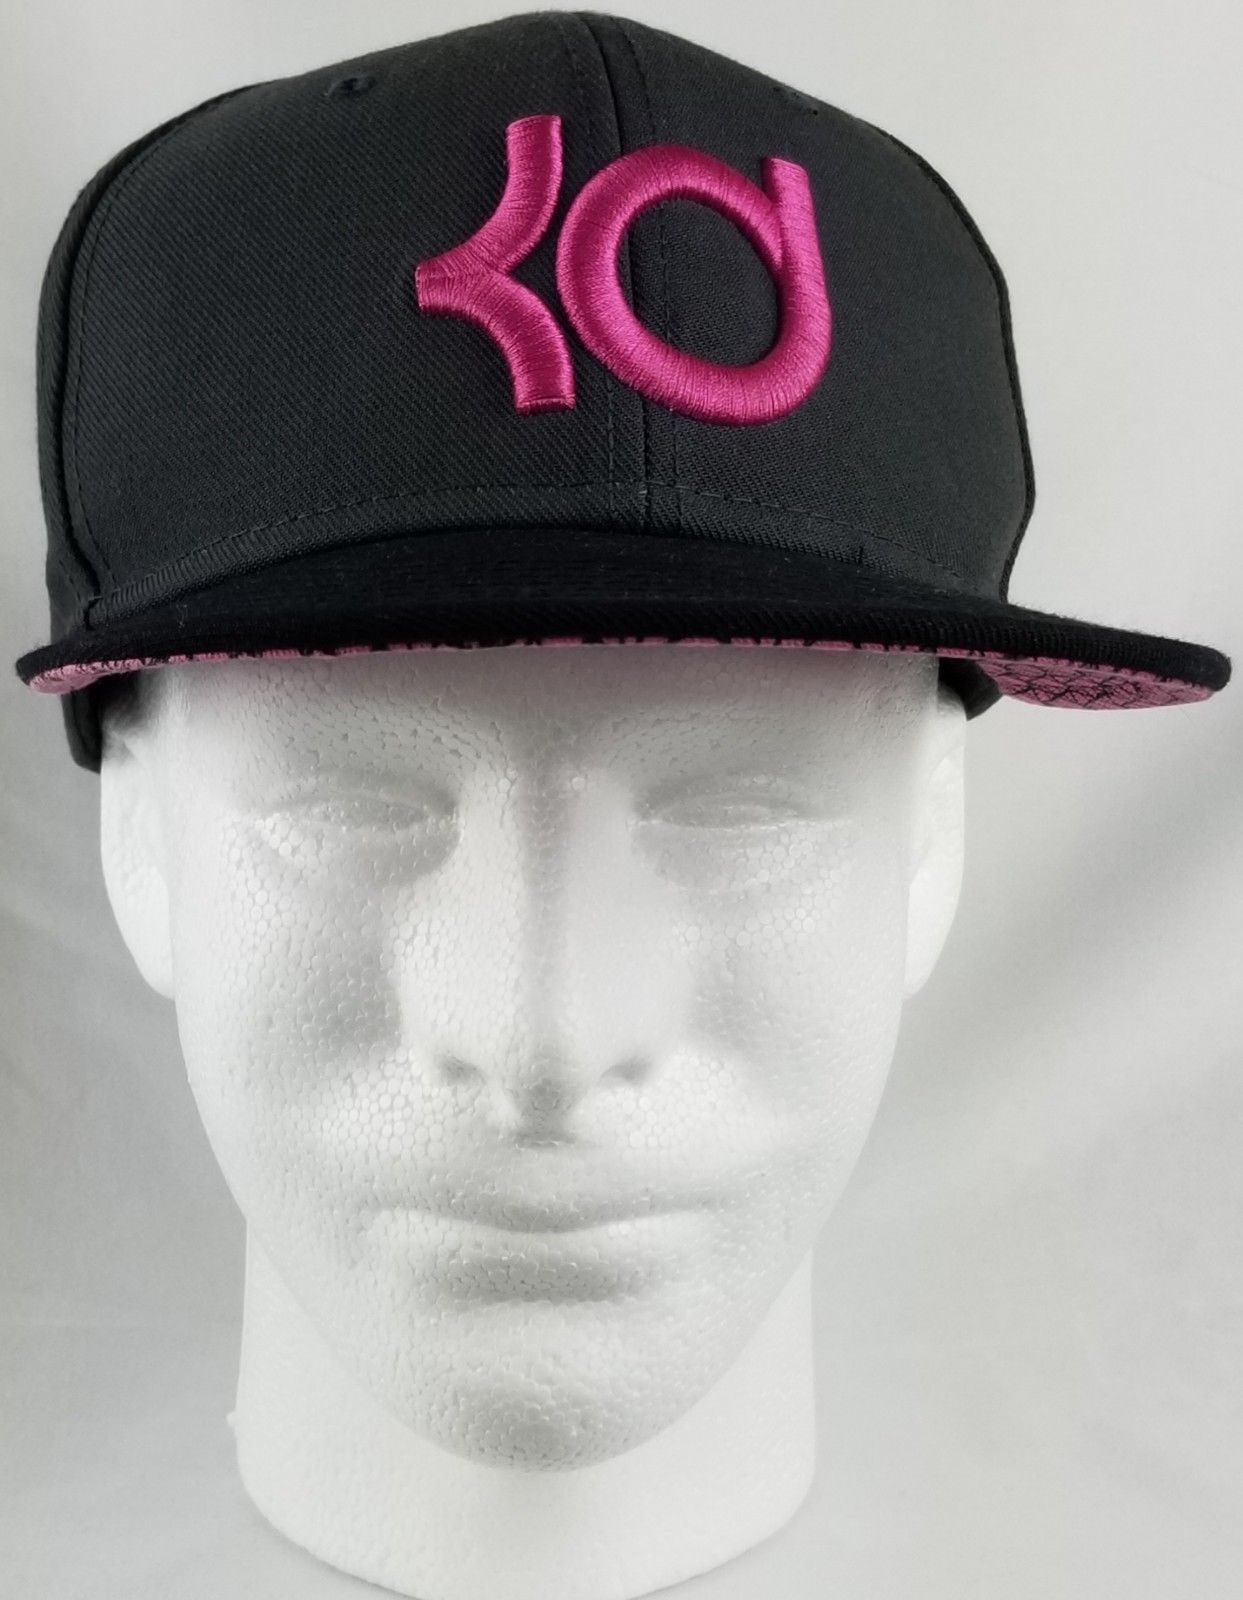 963e48834133e ... spain nike kd kevin durant nba true adult snapback hat cap w grey pink  logo 521c4